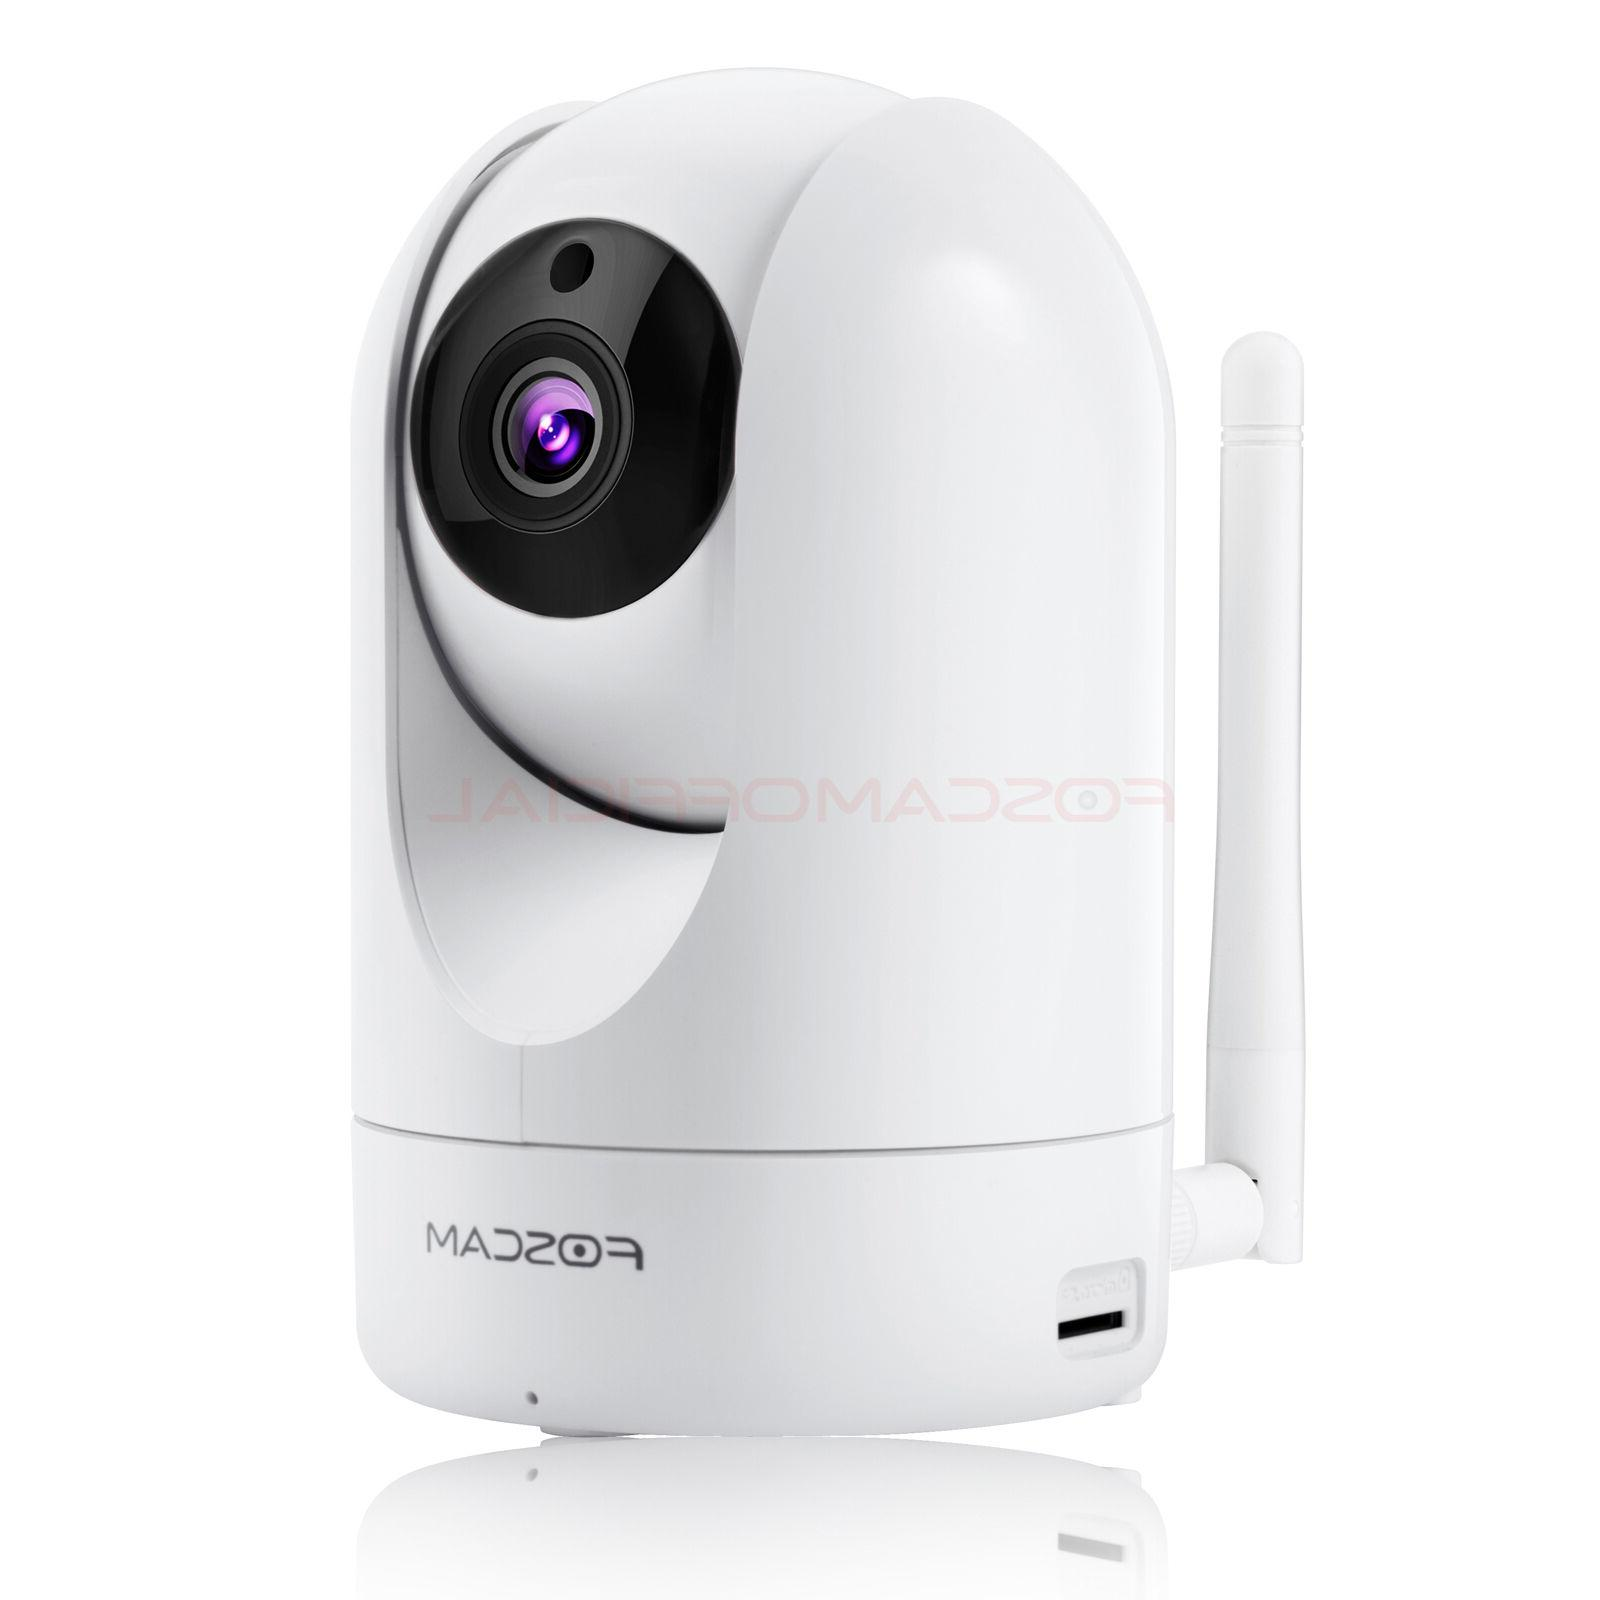 Foscam R4 Ultra HD 1440P 4.0MP Pan Tilt Zoom Wireless Wired